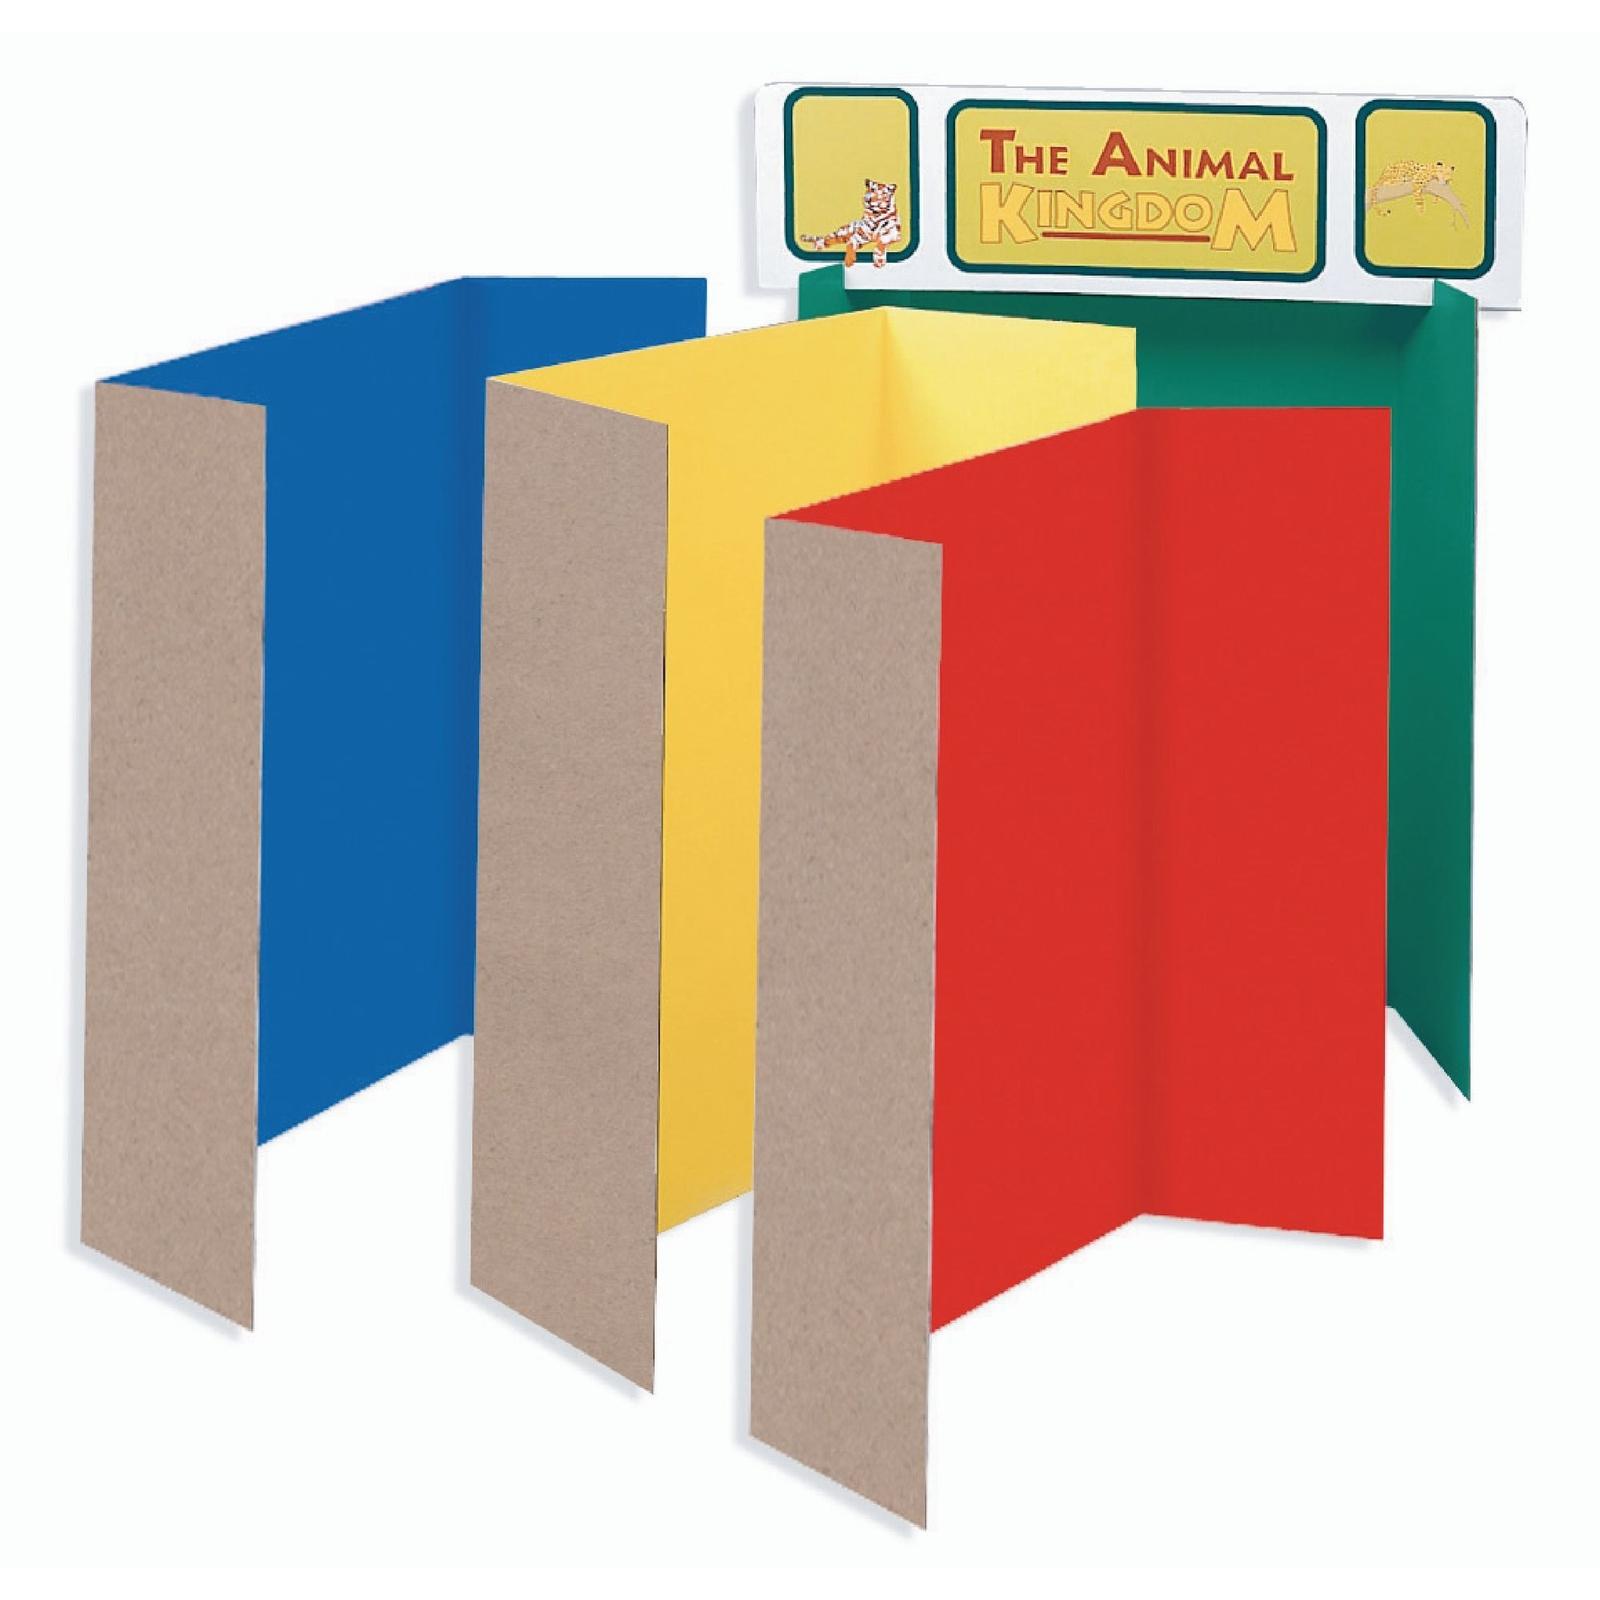 Presentation Boards - Assorted